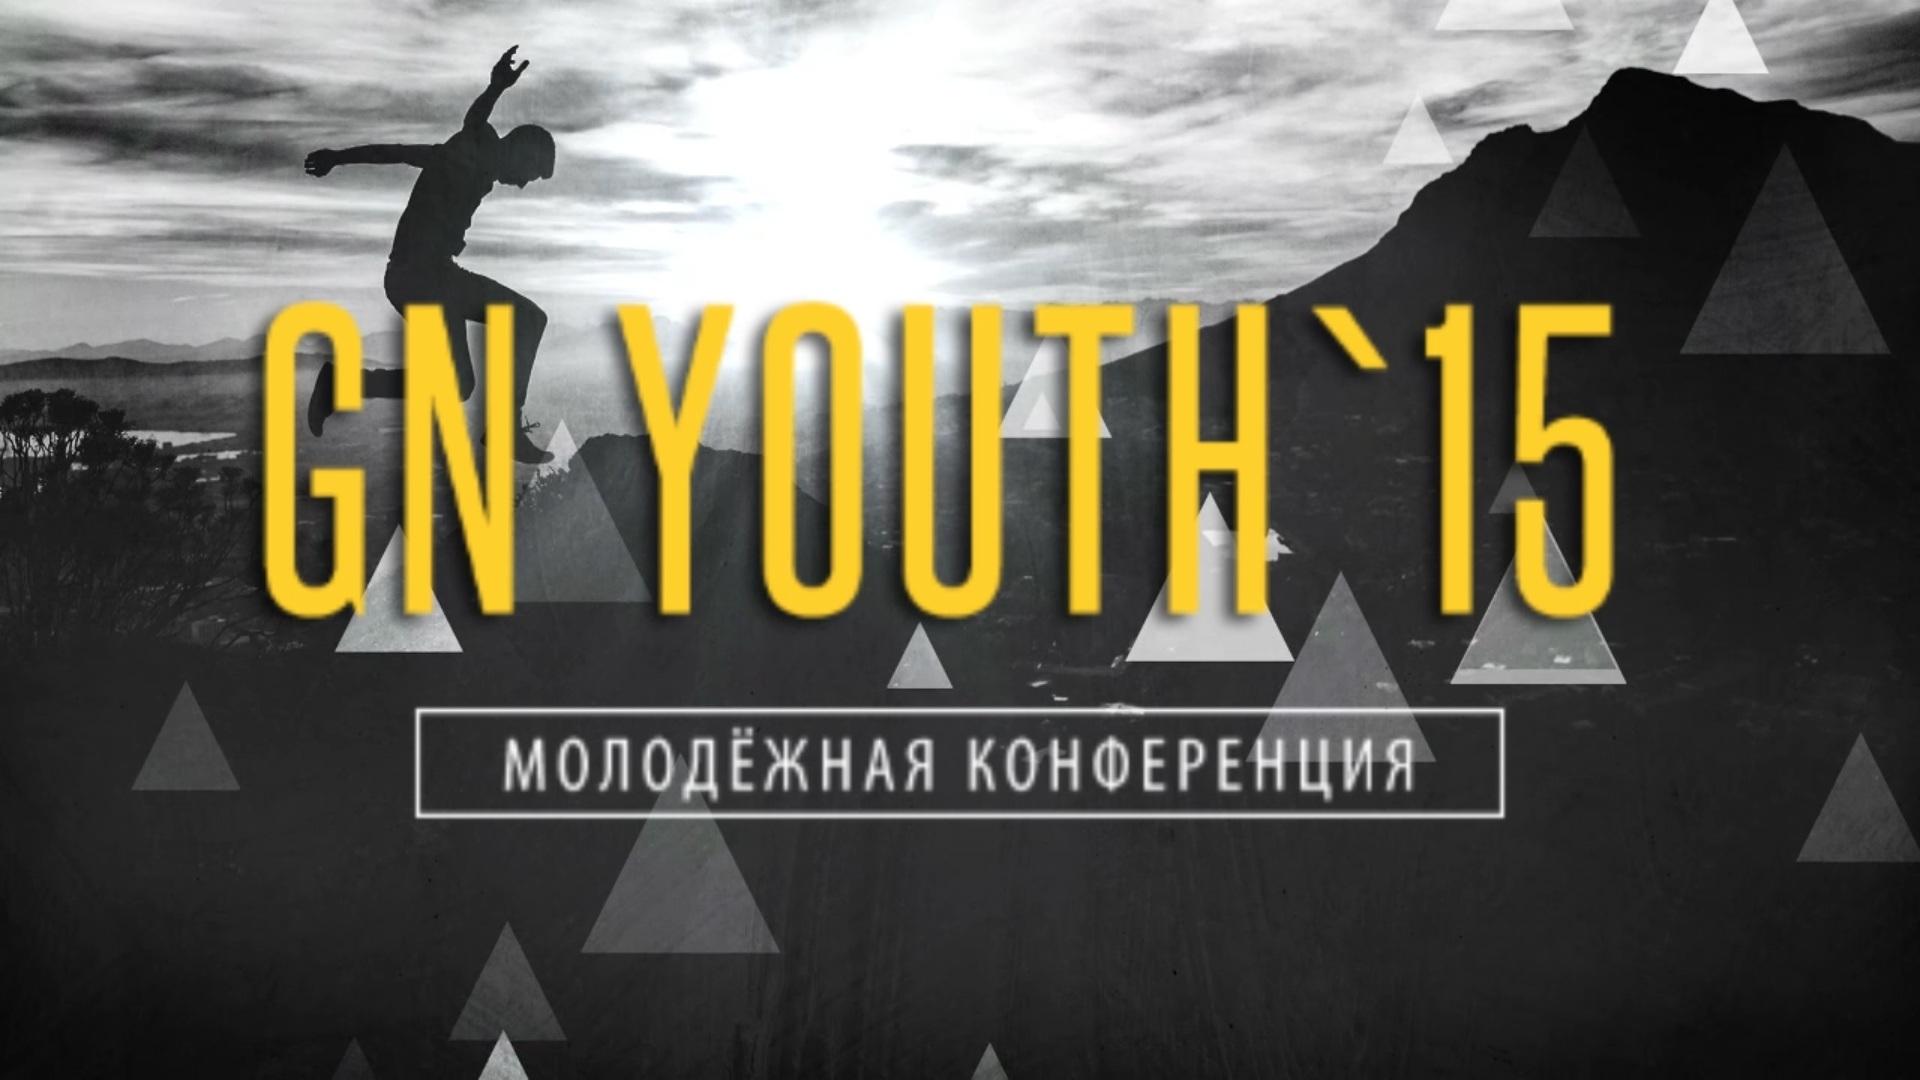 Молодежная Конференция GNYOUTH15